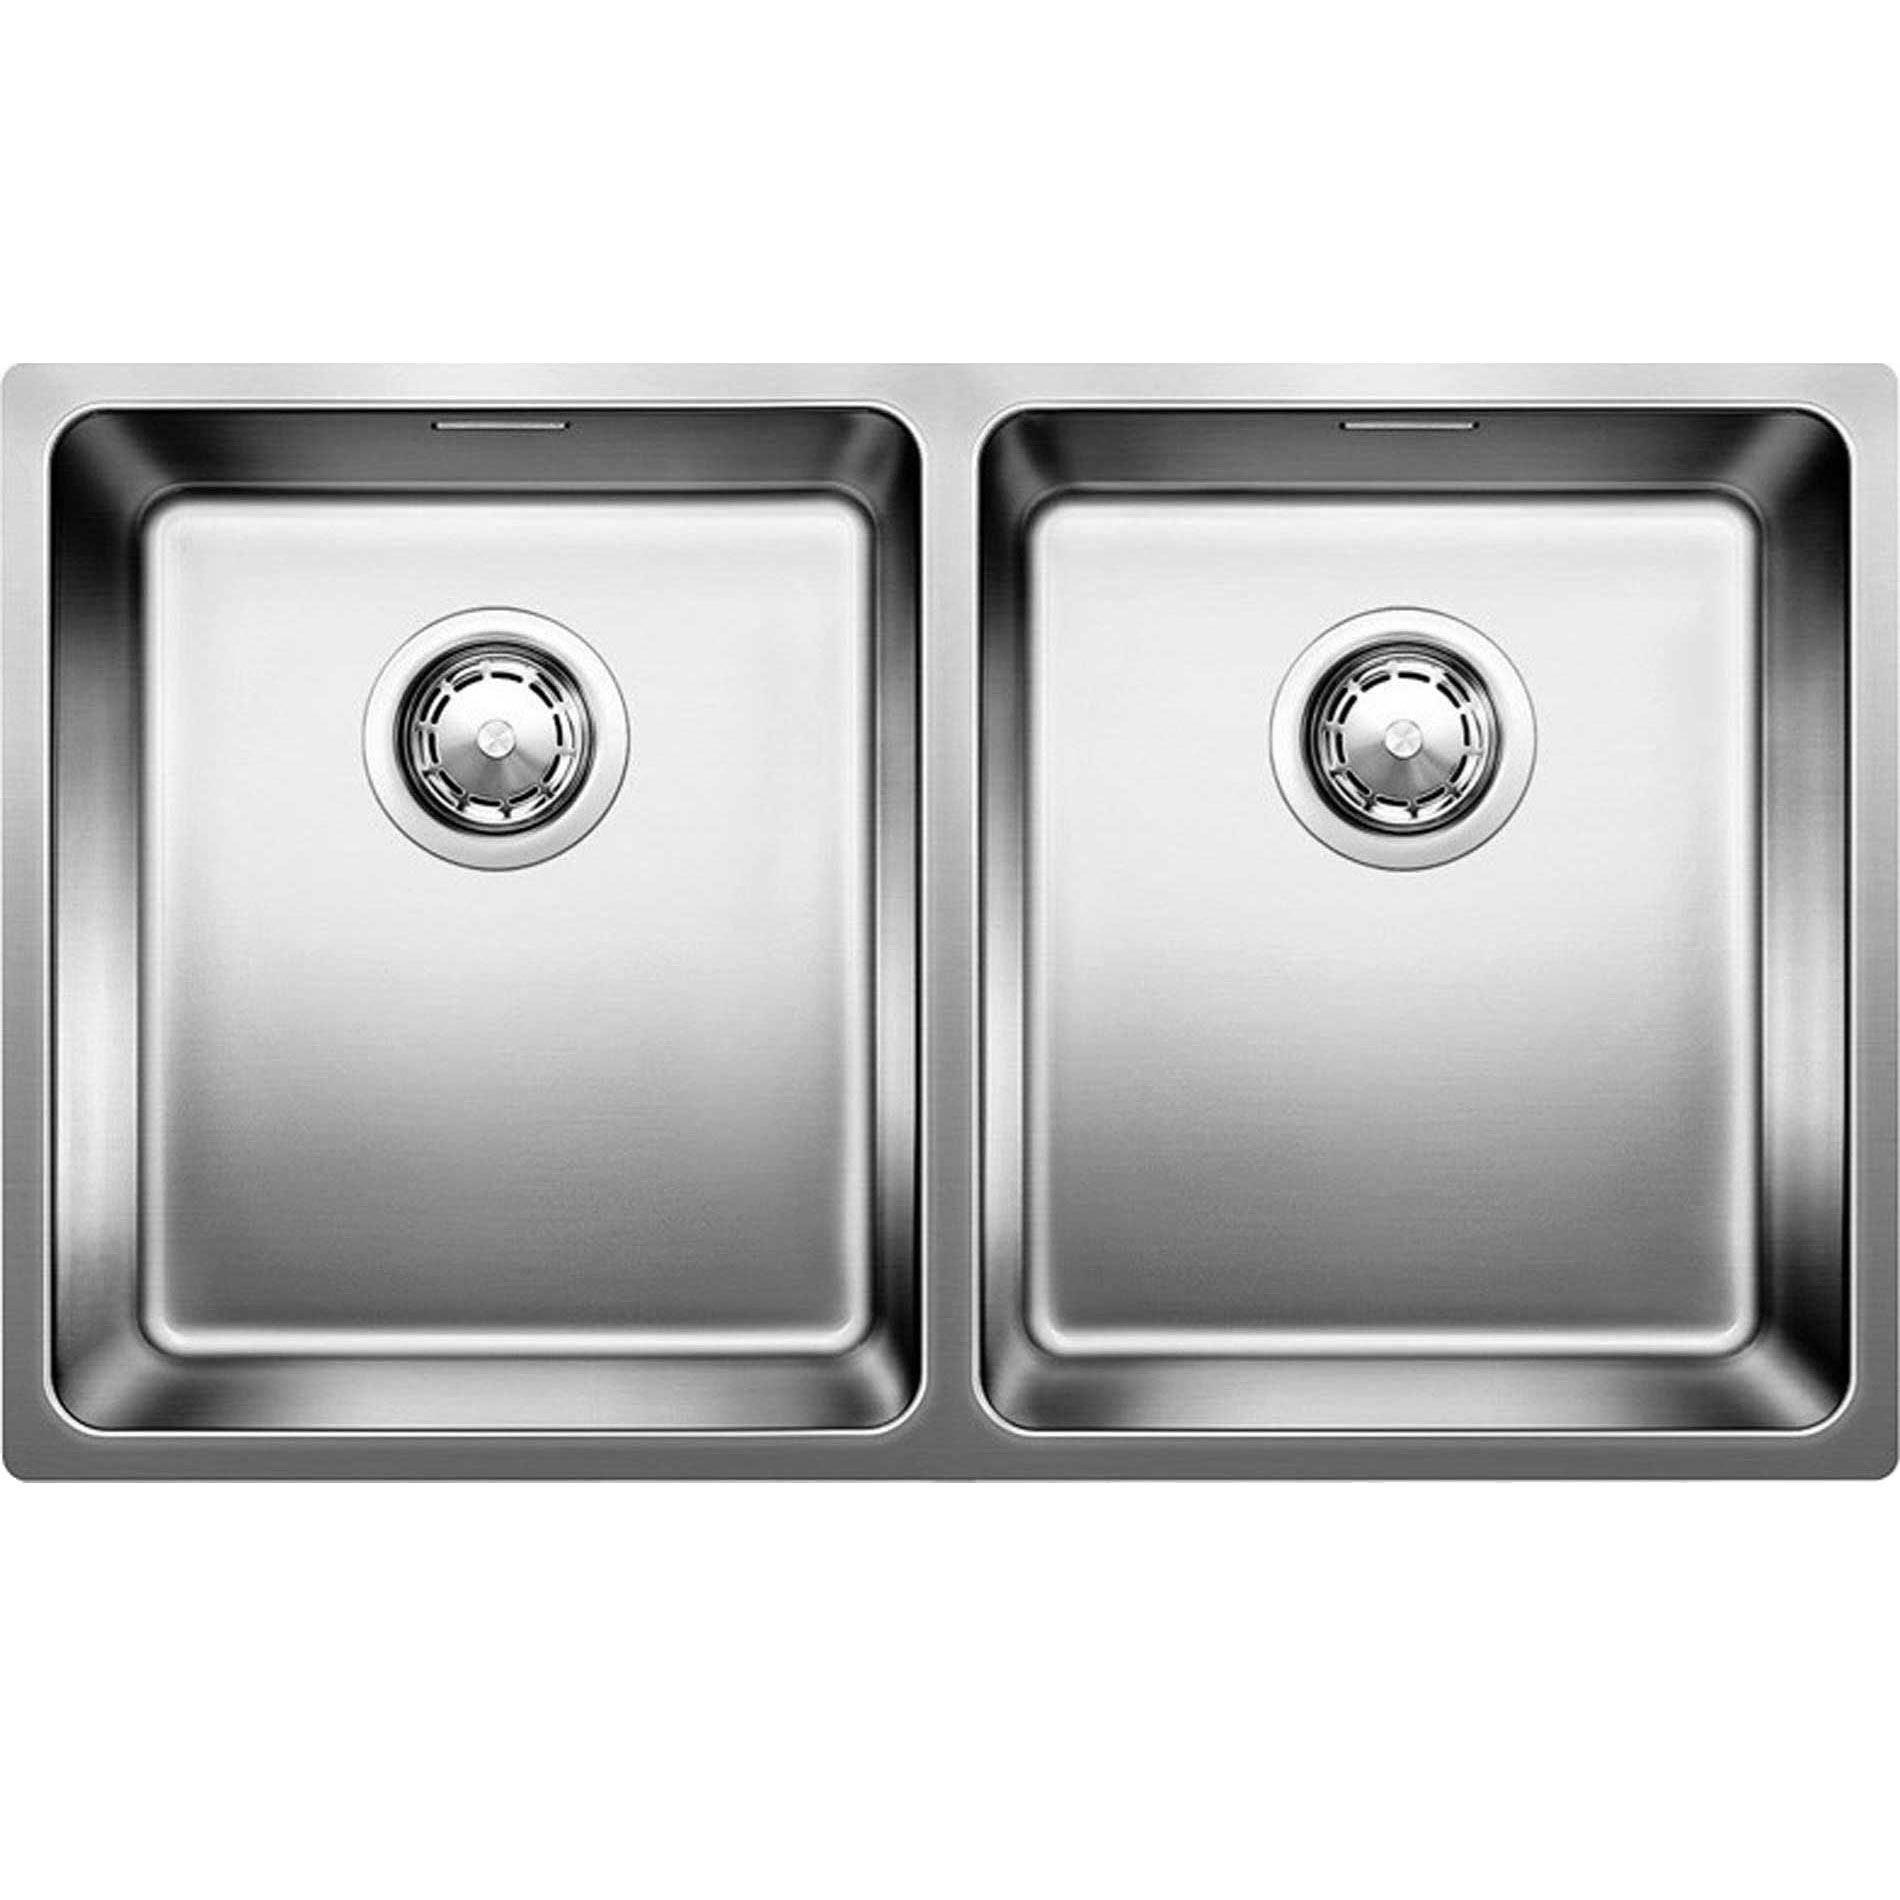 Blanco Andano 340 340 U Stainless Steel Sink Kitchen